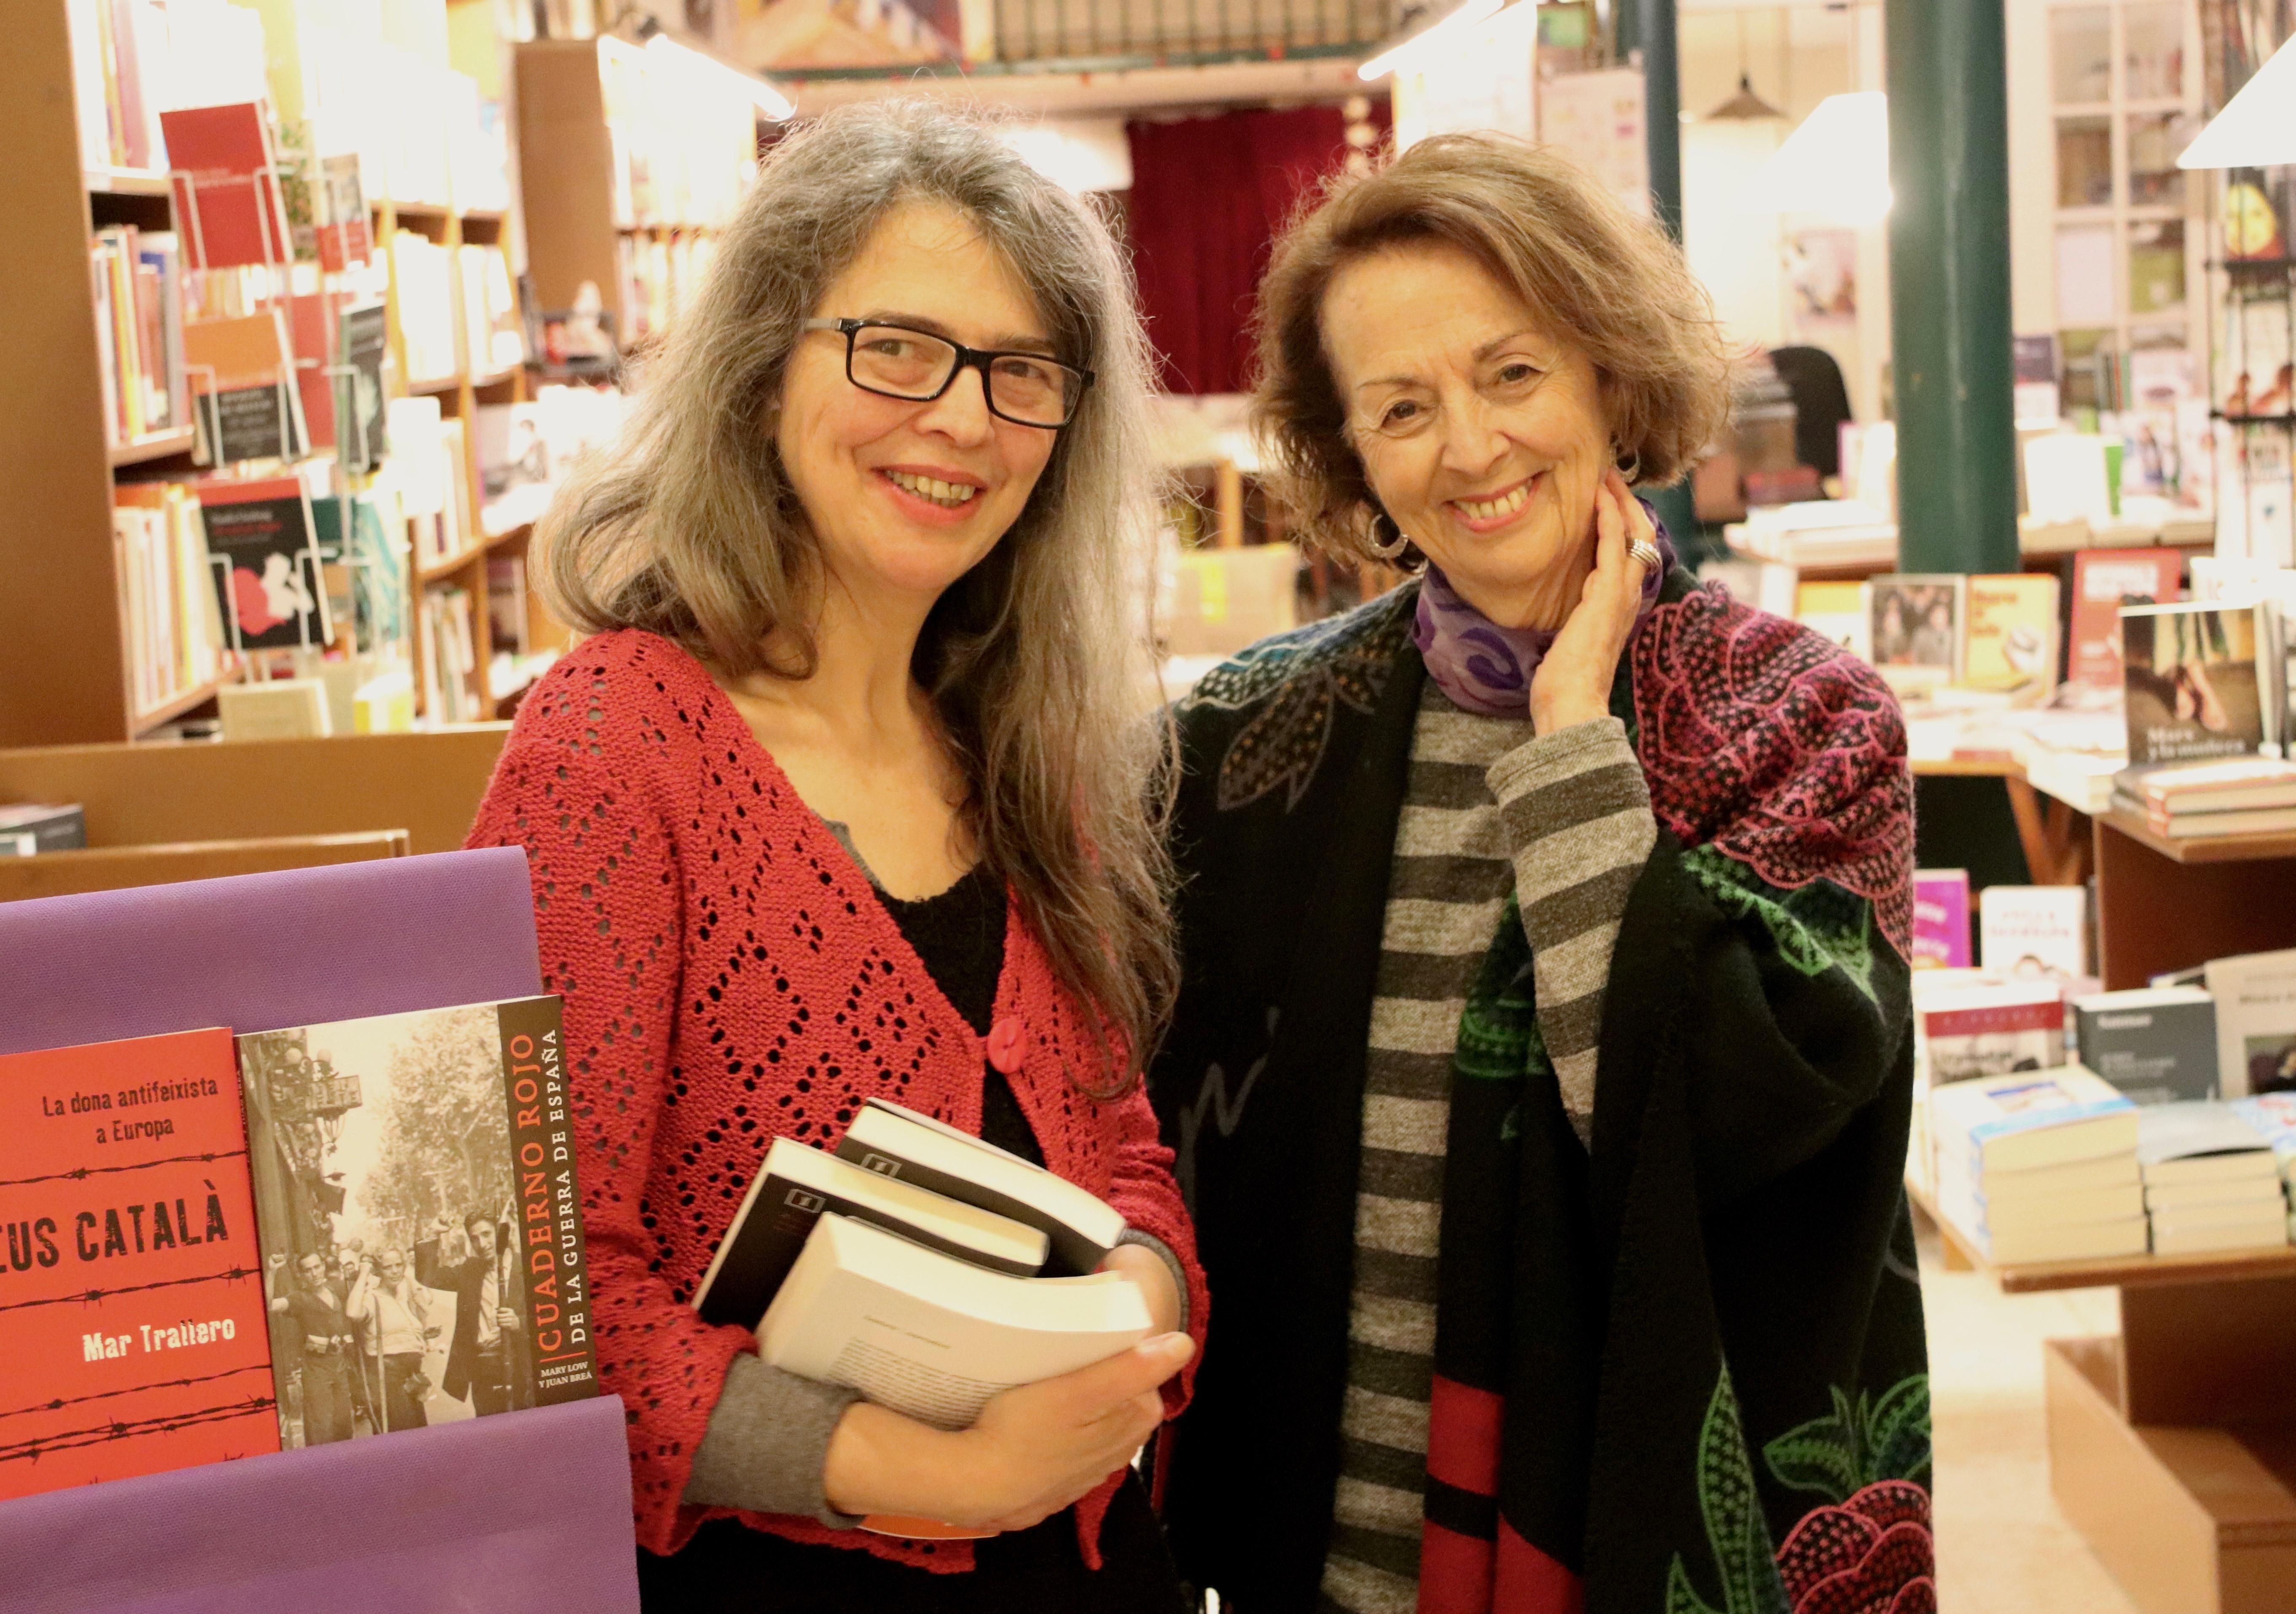 Un Pròleg para los libros con acento feminista